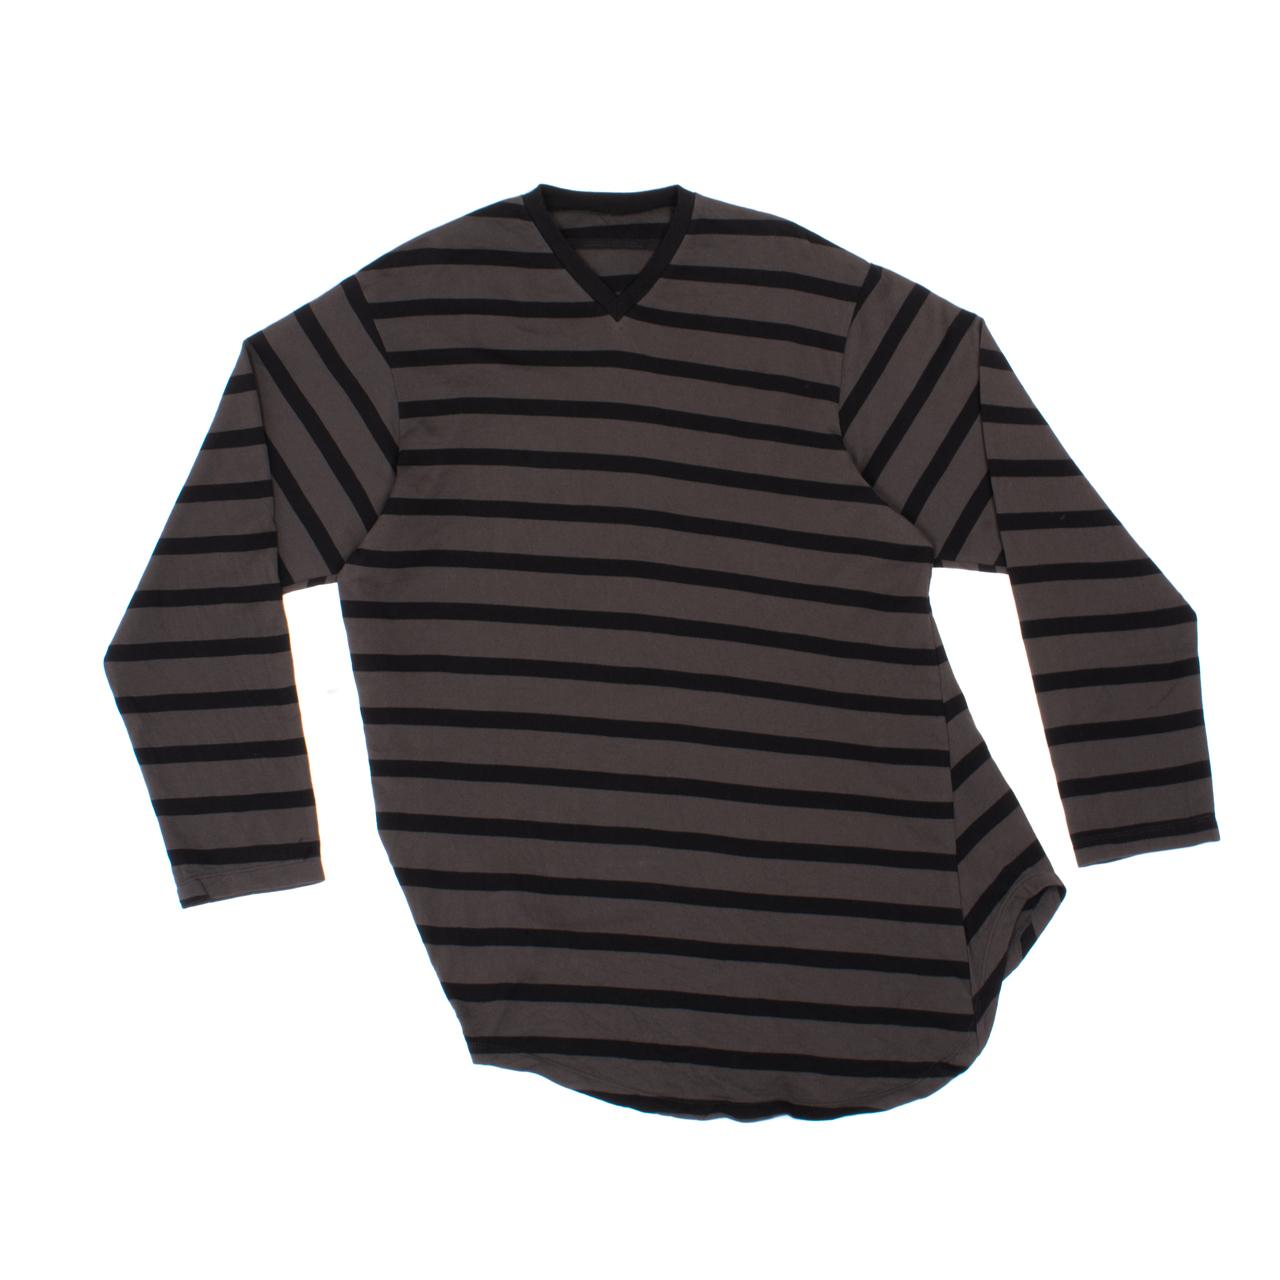 707CUM2-CHARCOAL×BLACK / ストライプロングスリーブ Tシャツ